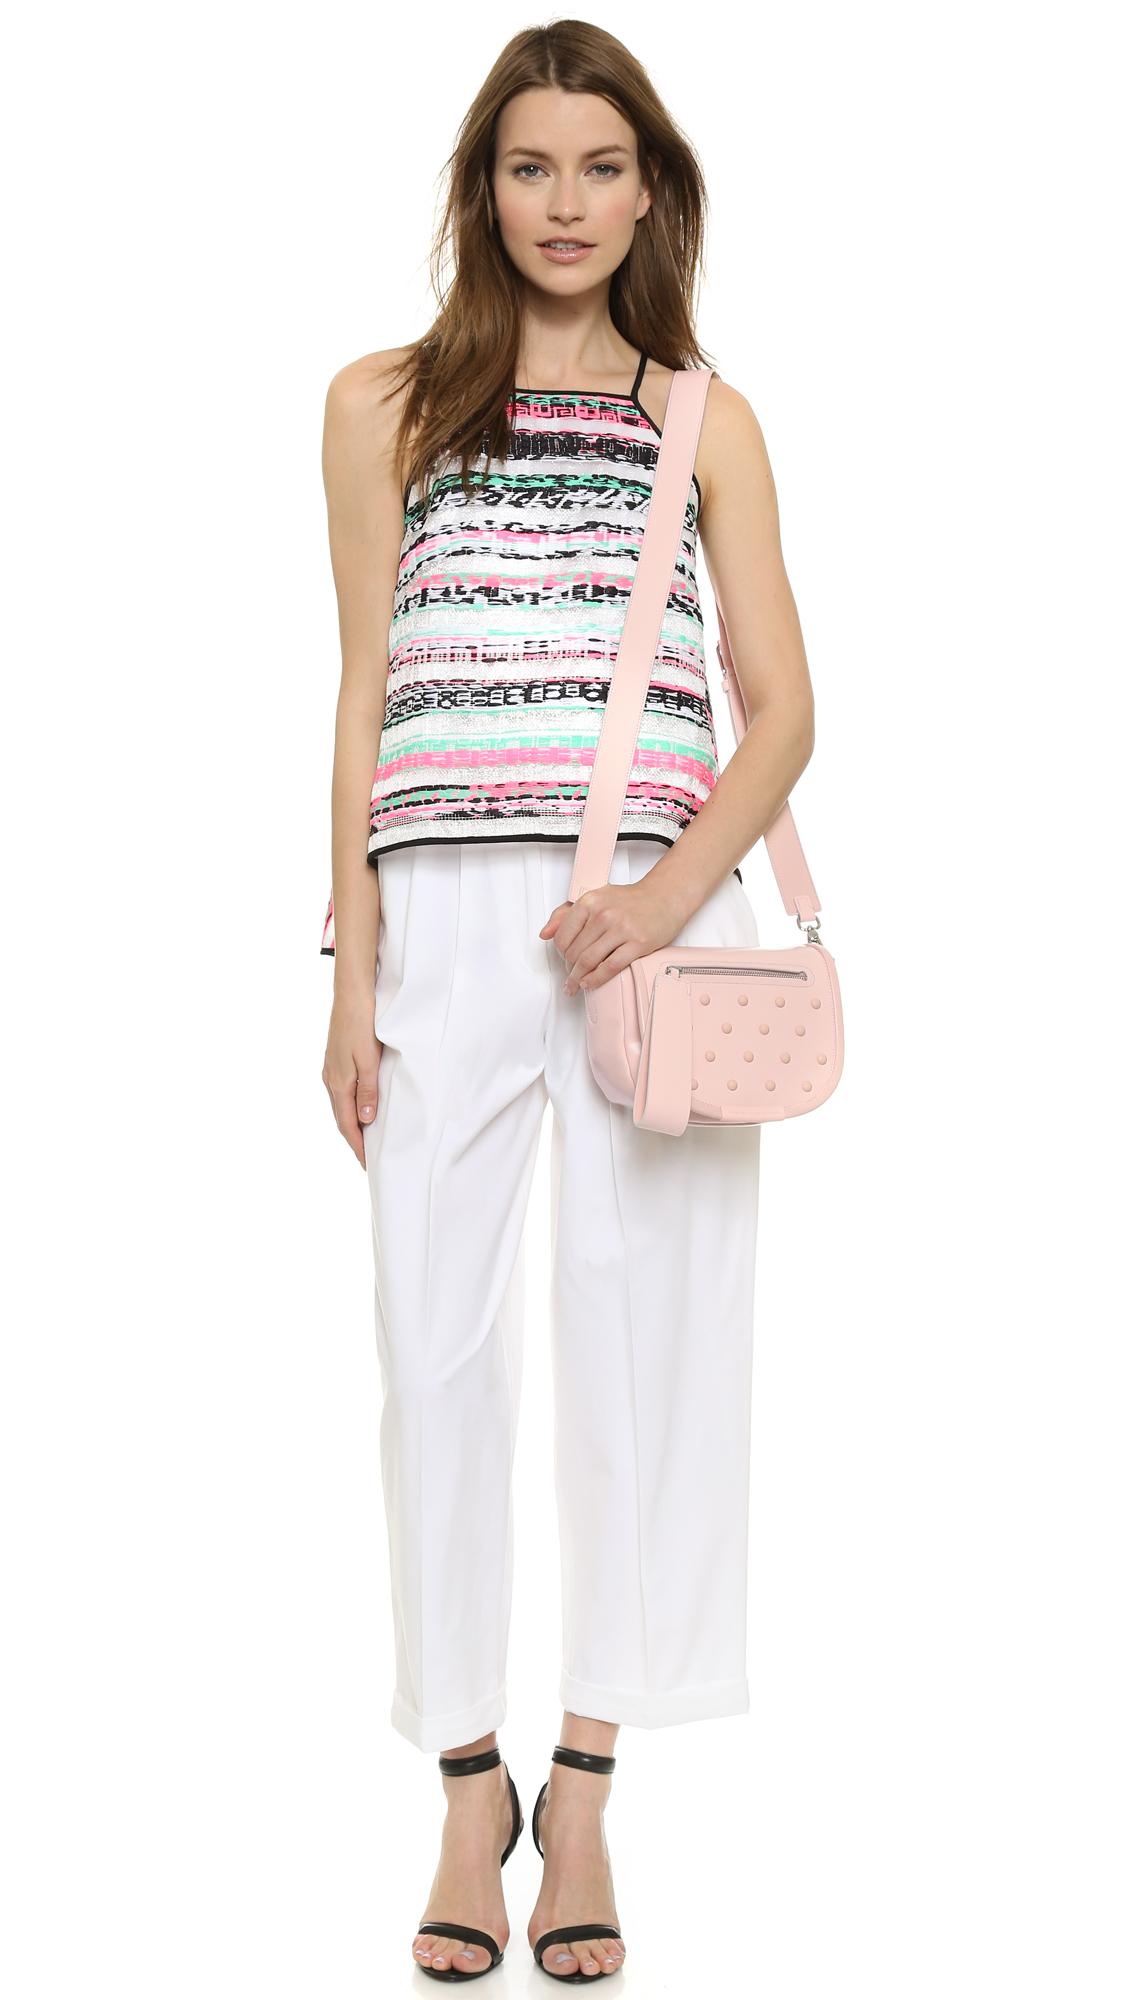 Marc By Marc Jacobs Runway Luna Studs Cross Body Bag - New Cloud in Pink